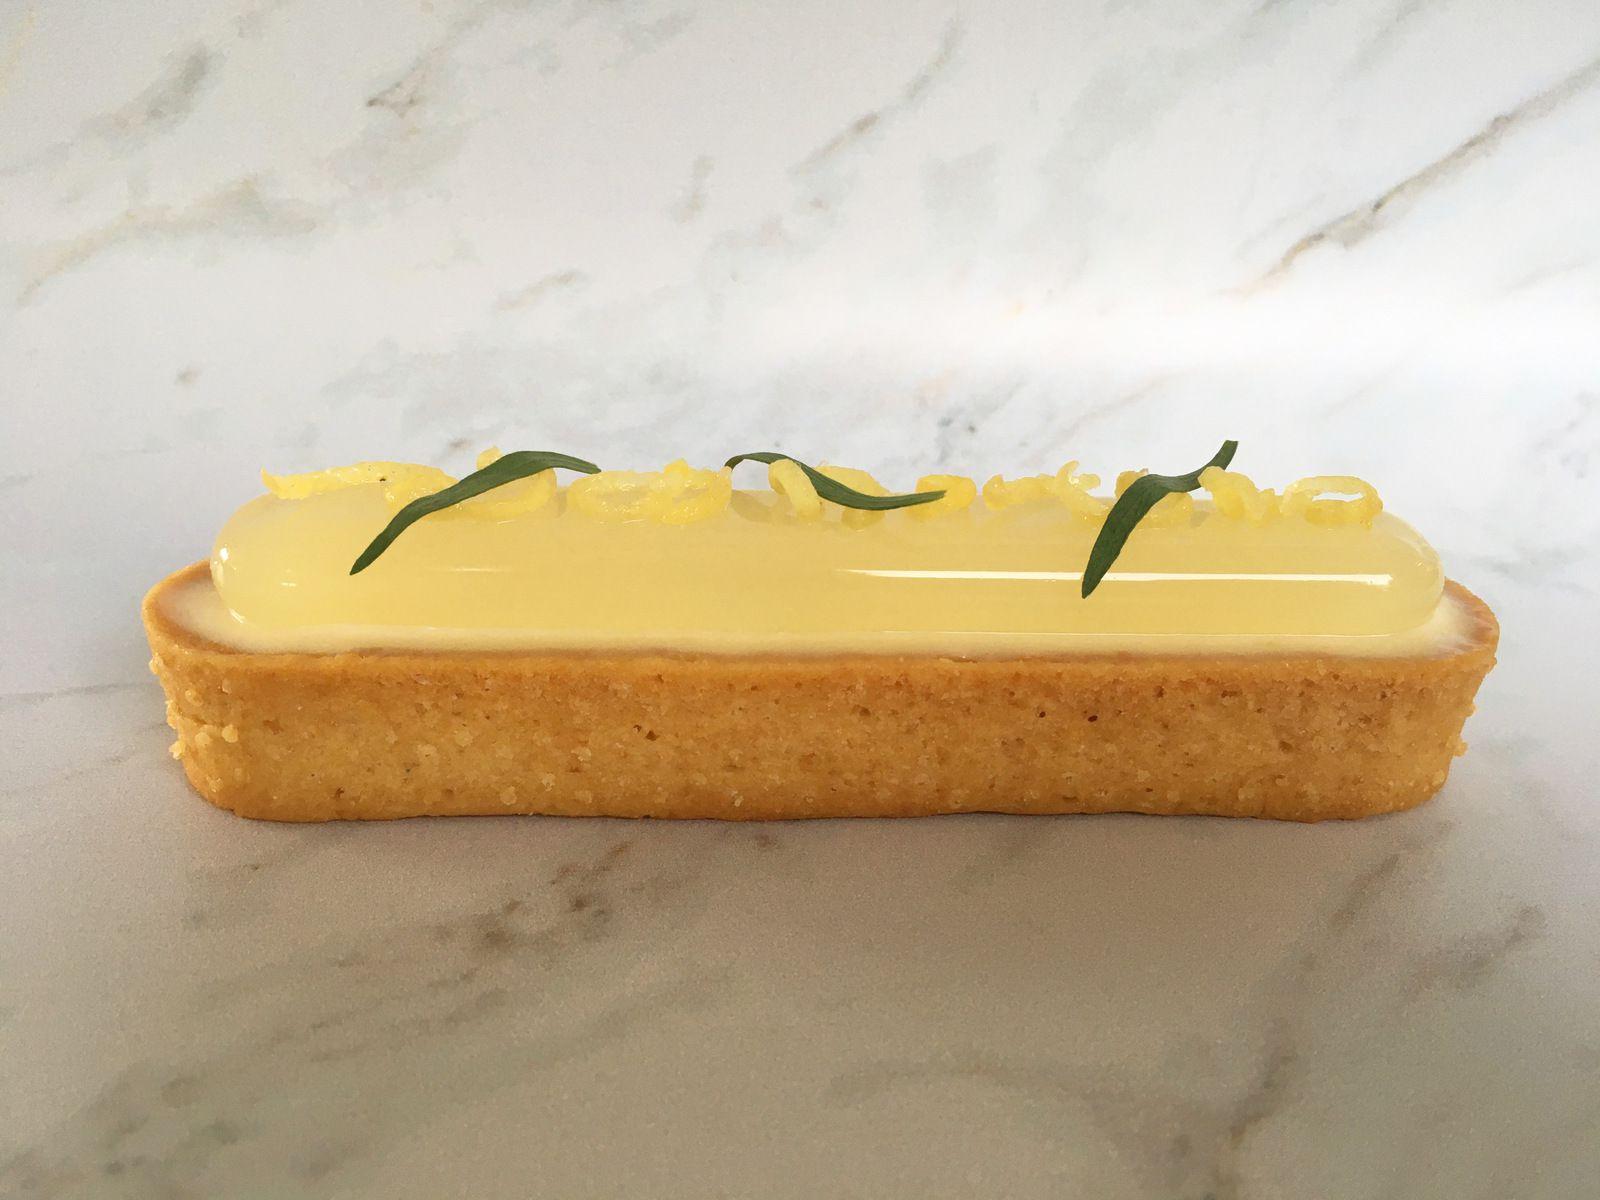 La tarte Citron-Estragon de Frédéric Bau